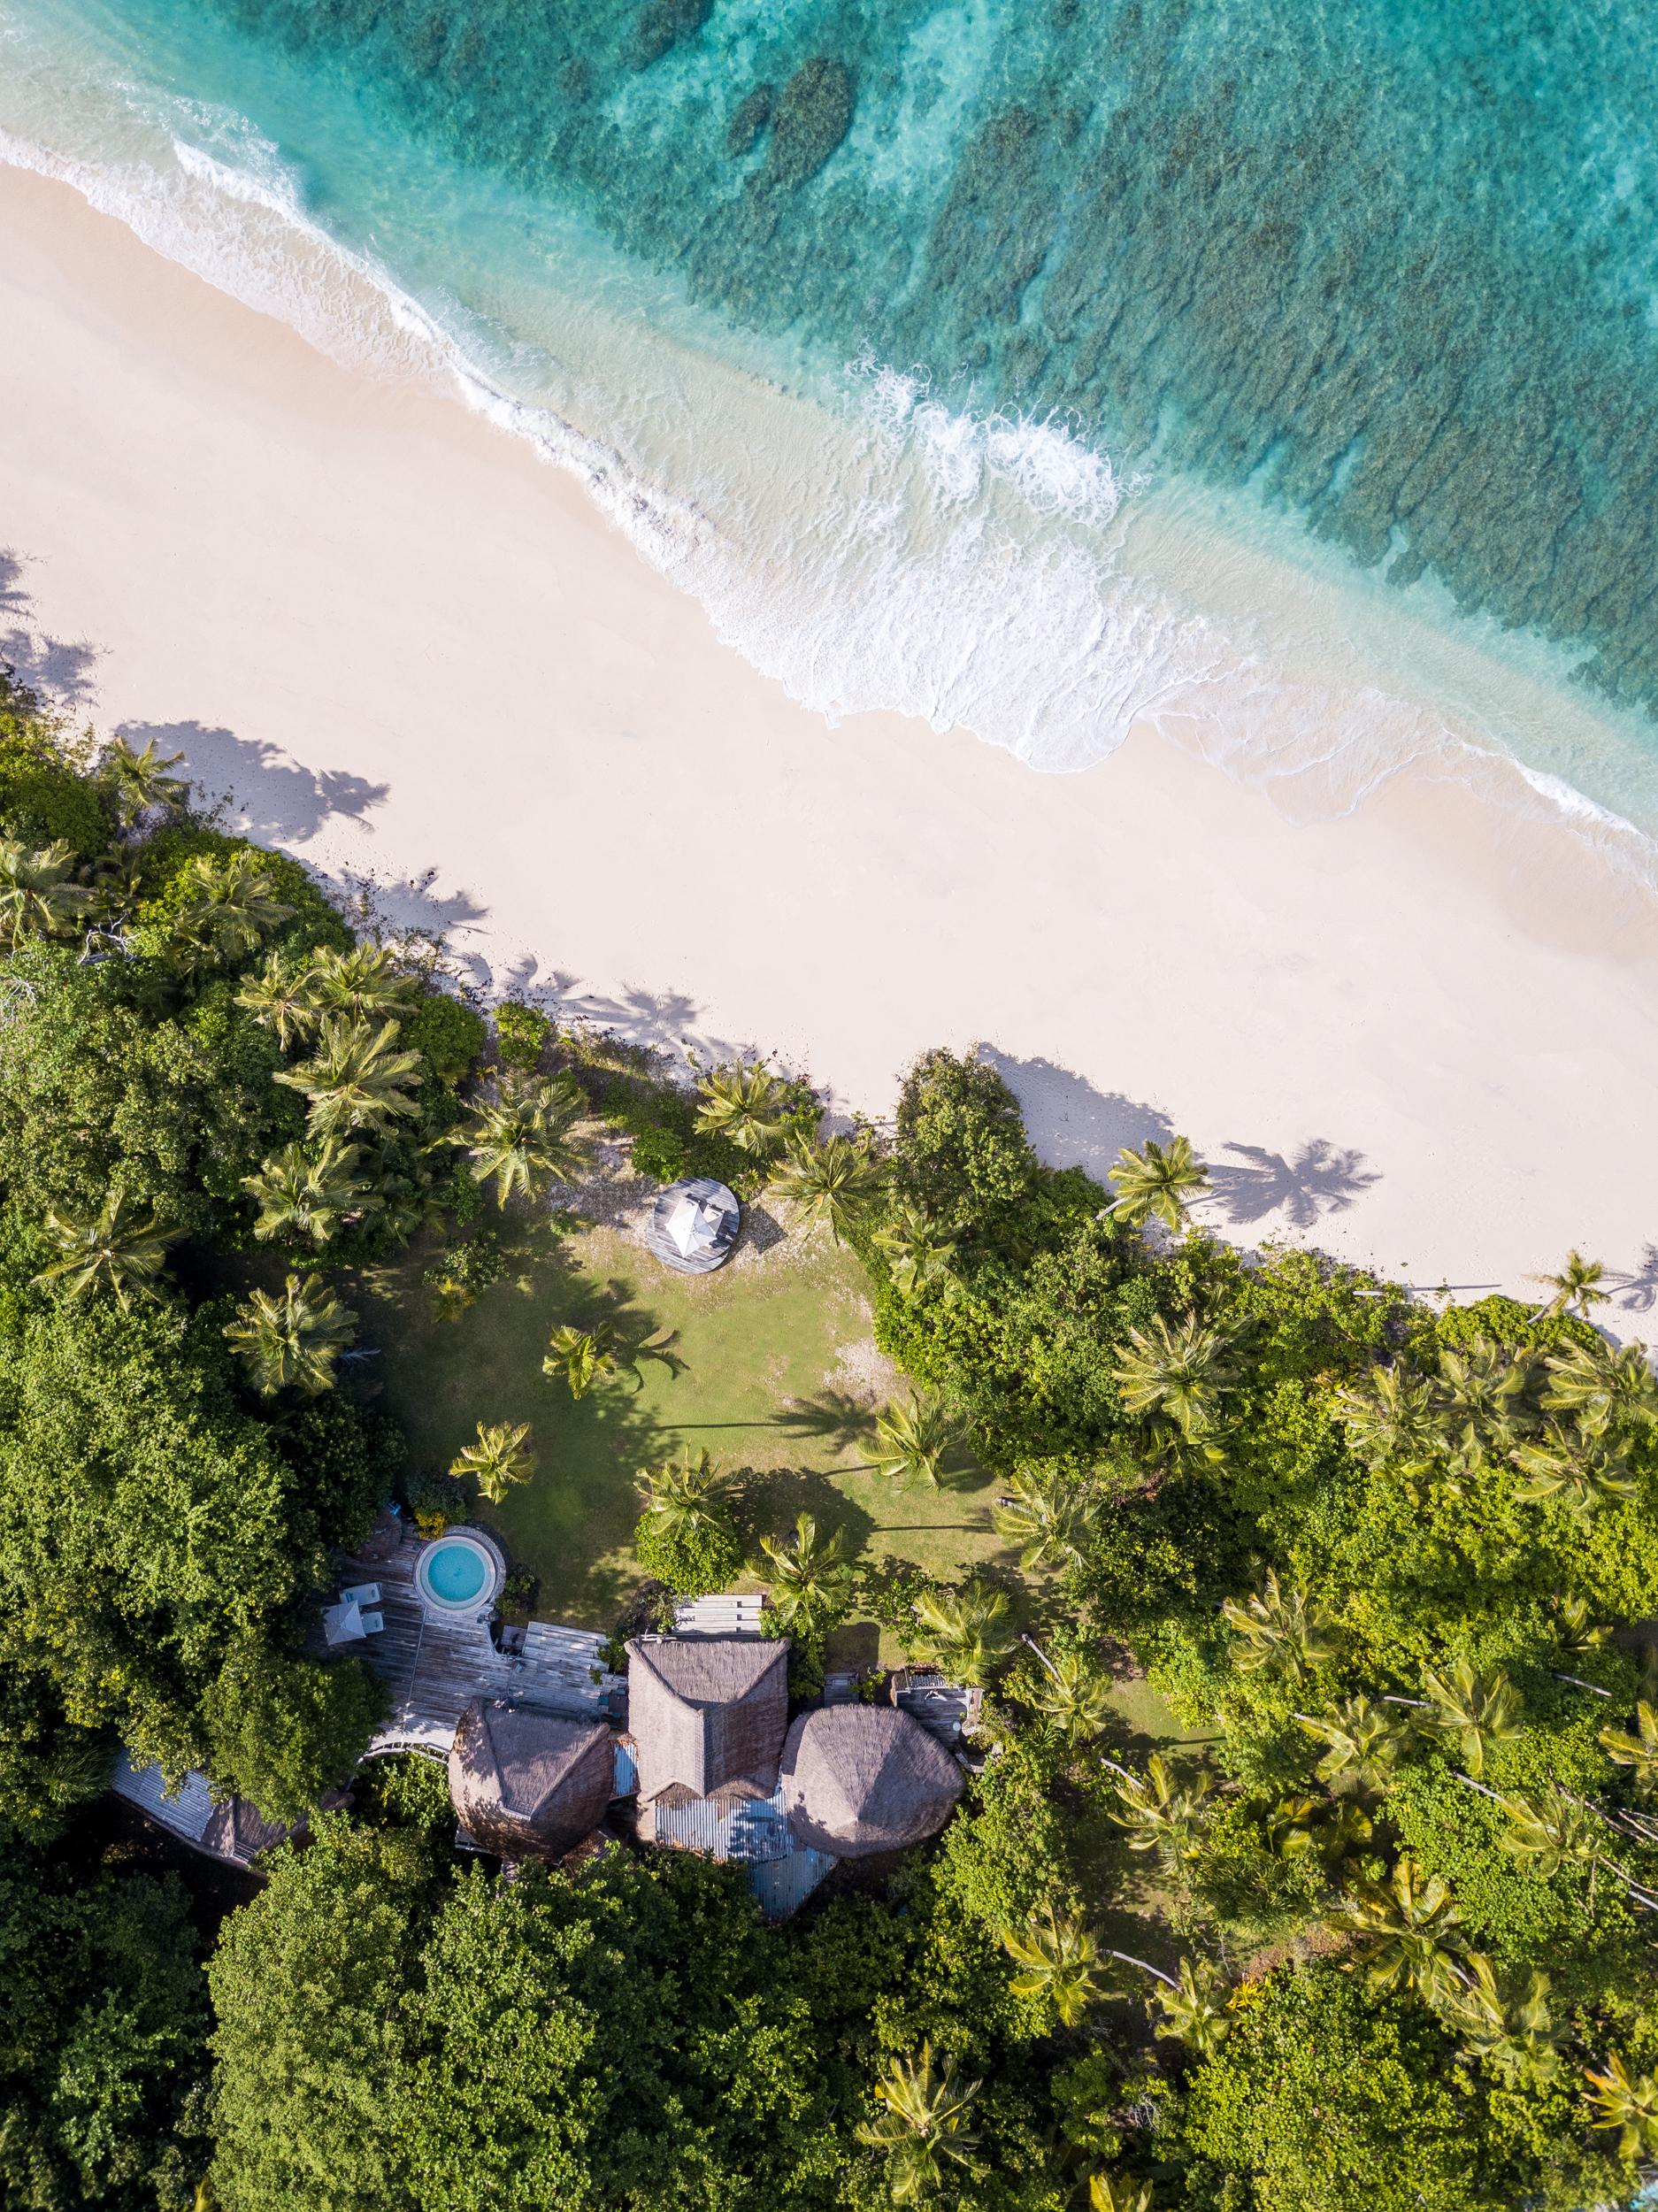 021North Island-2019-Villa6-DJI-HDR-Edit.jpg